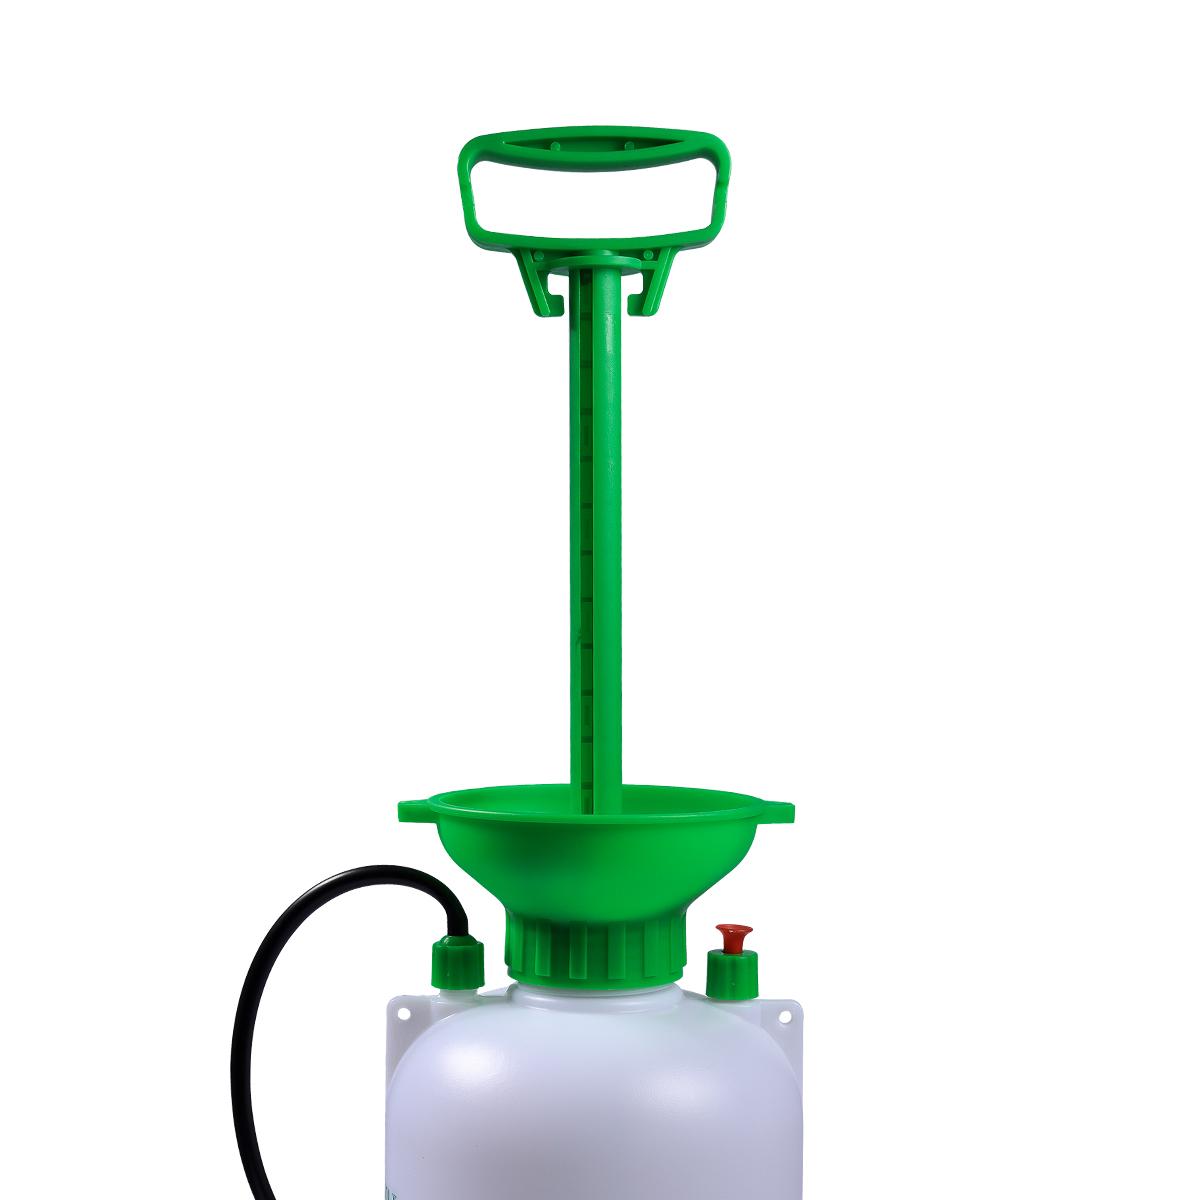 Pulverizador Pressão Acumulada 8 Litros SuperAgri SAPPA8L + Pulverizador Borrifador Manual Pressão Acumulada 2 Litros